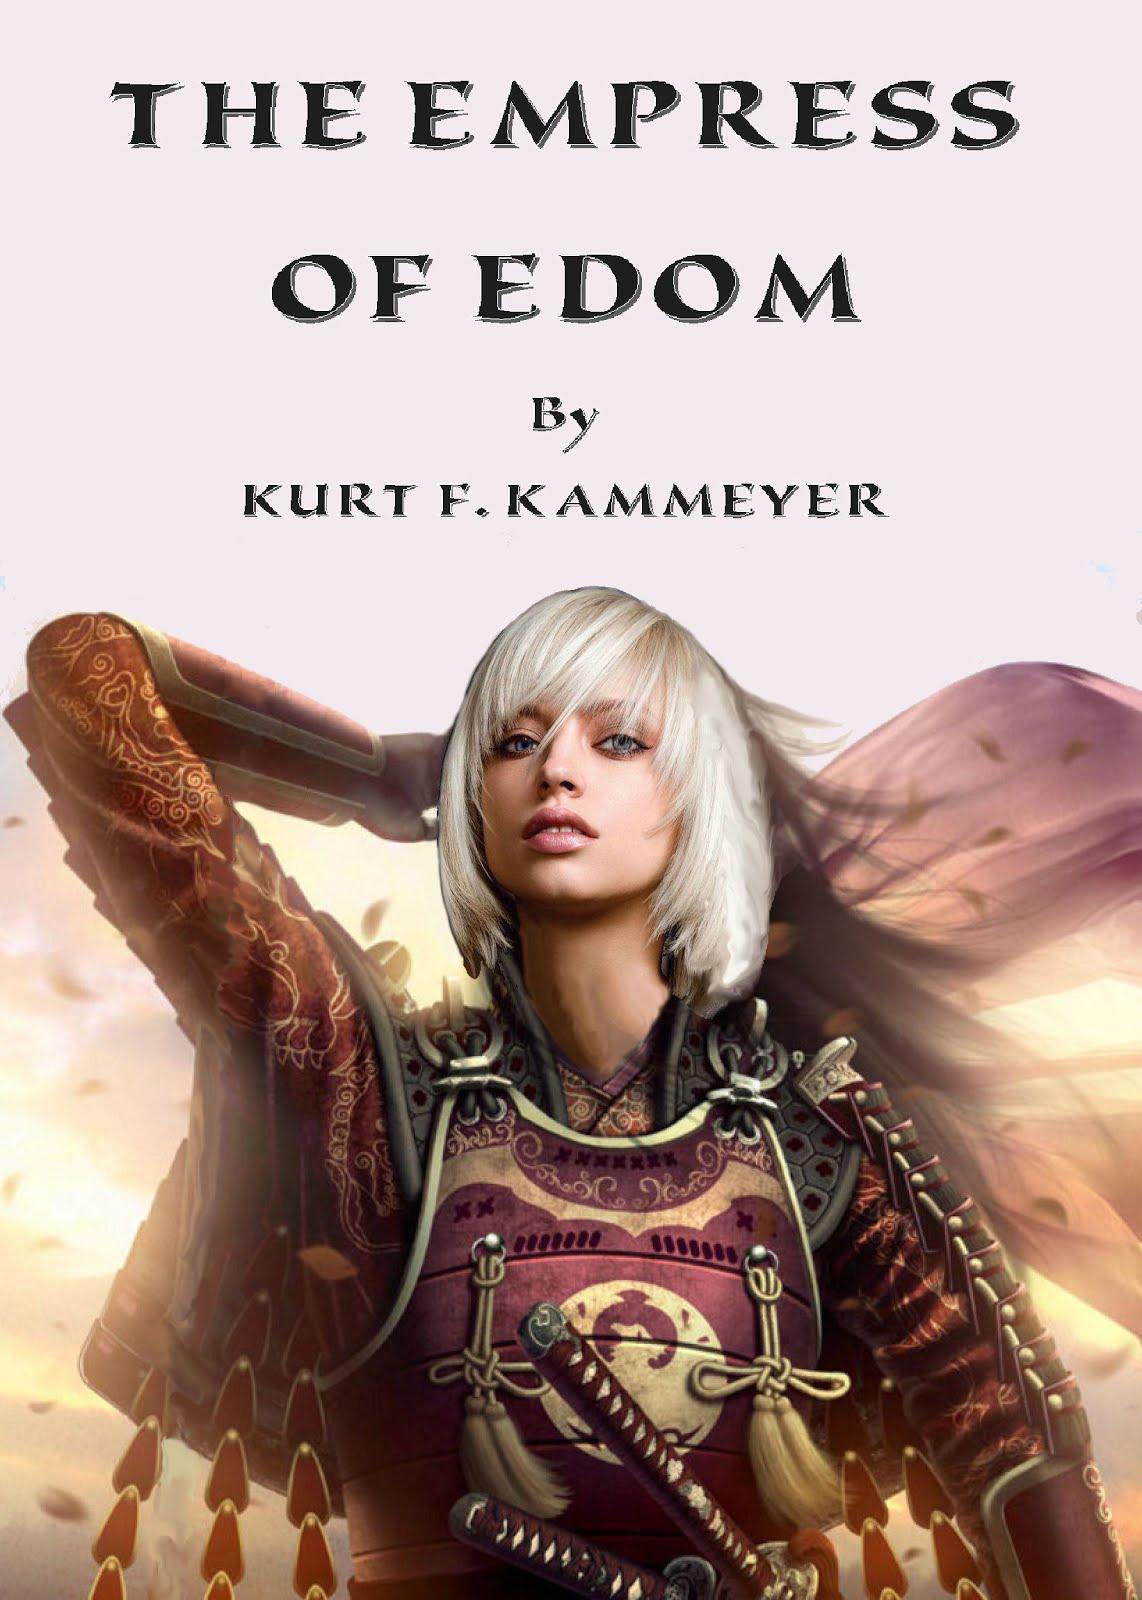 The Empress of Edom